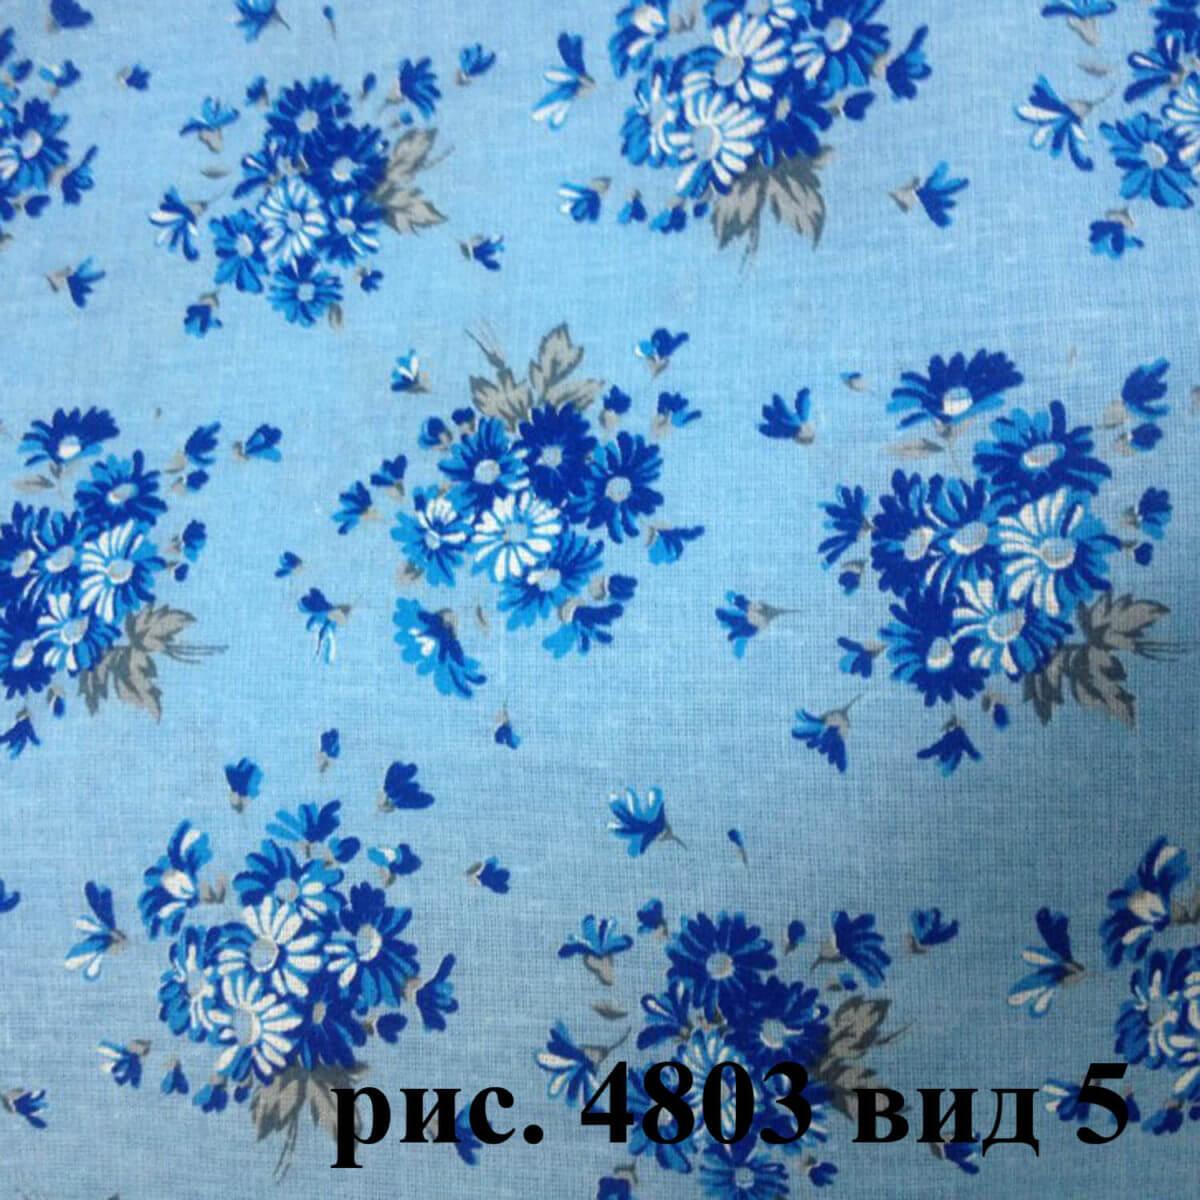 Фото 16 - Плательная ткань бязь 150 см (4803/2) Под заказ!.